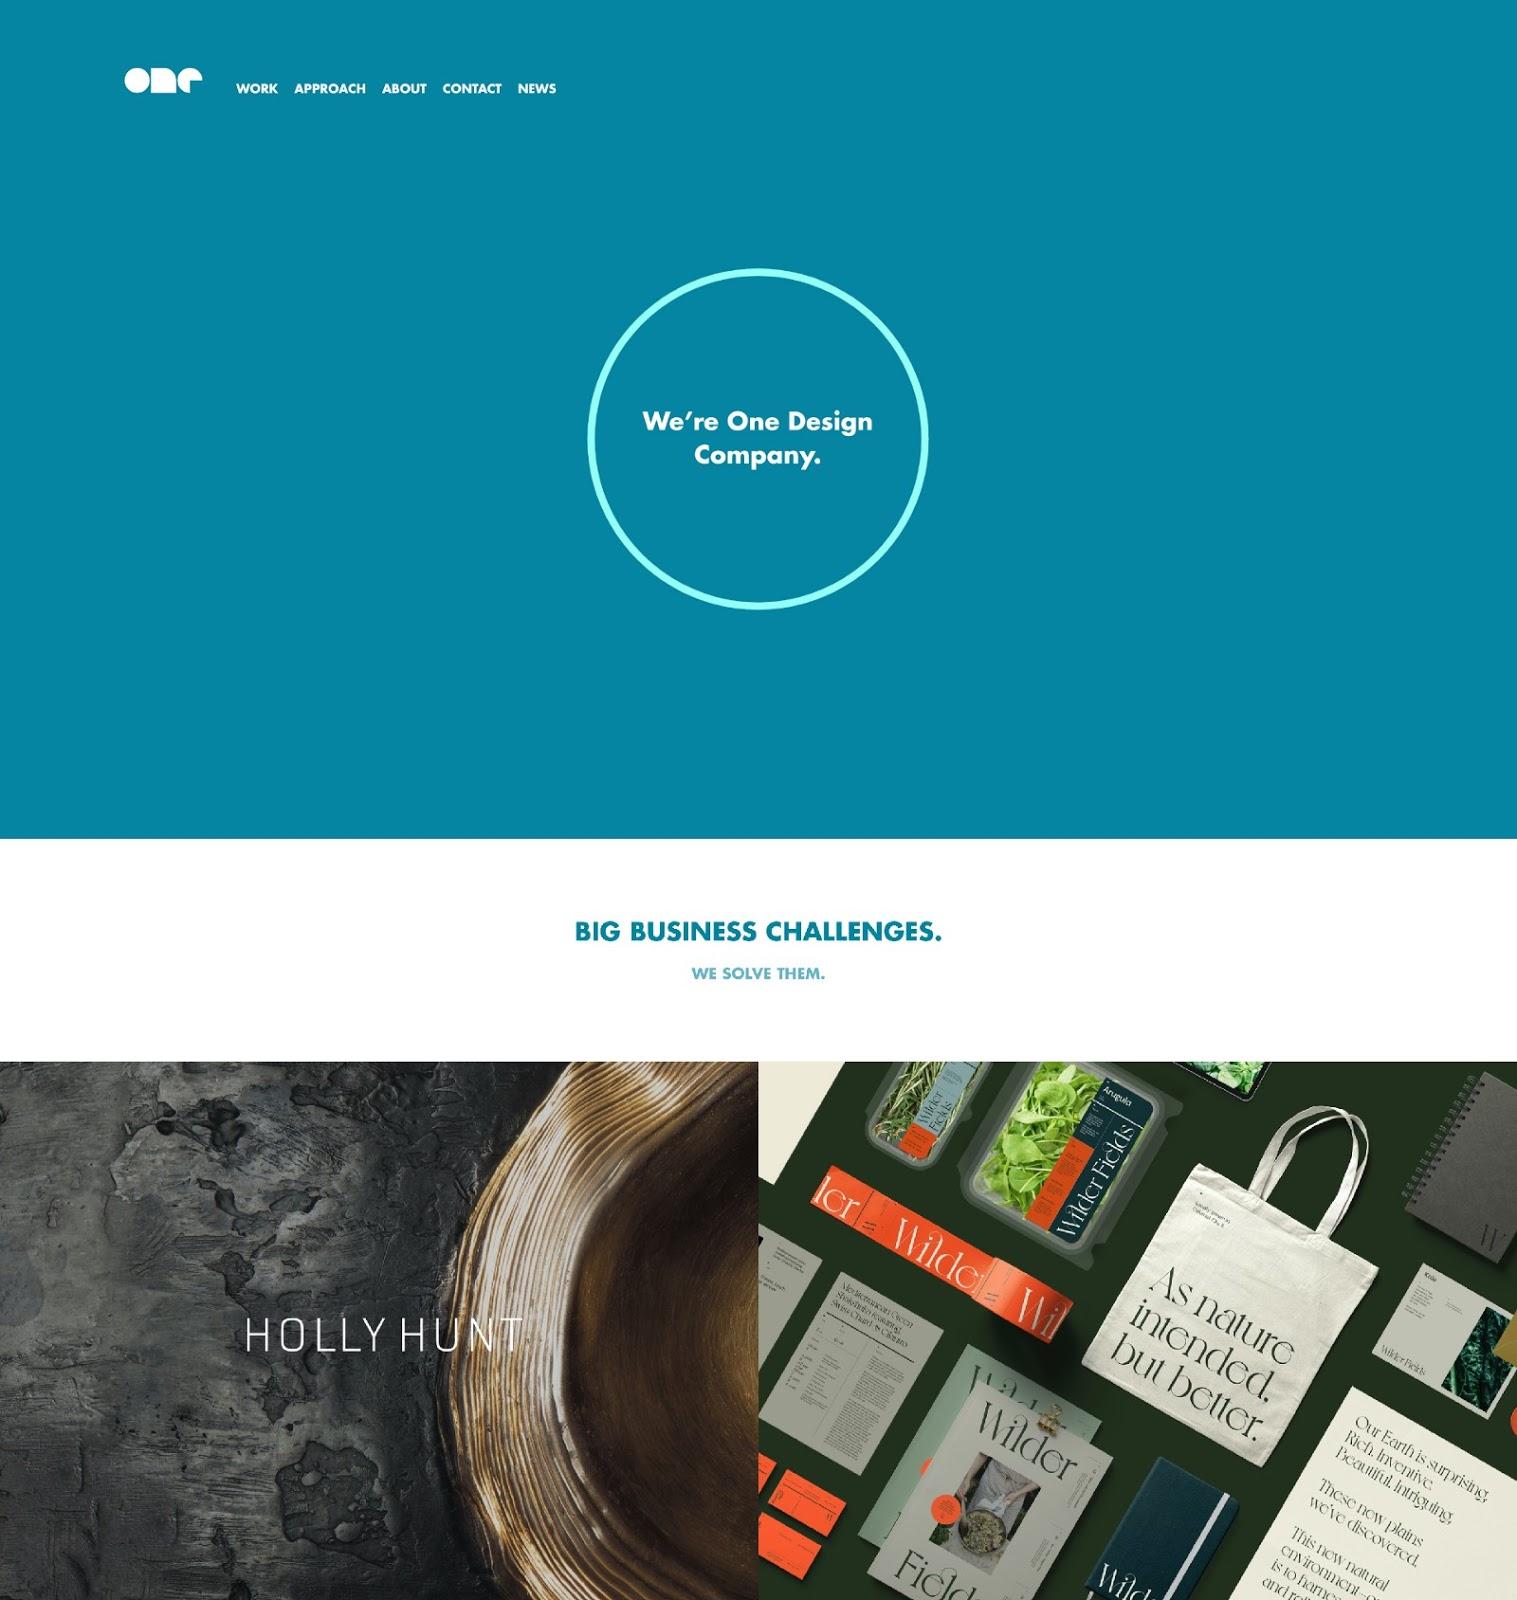 Web design company portfolio website example (source: One Design Company)